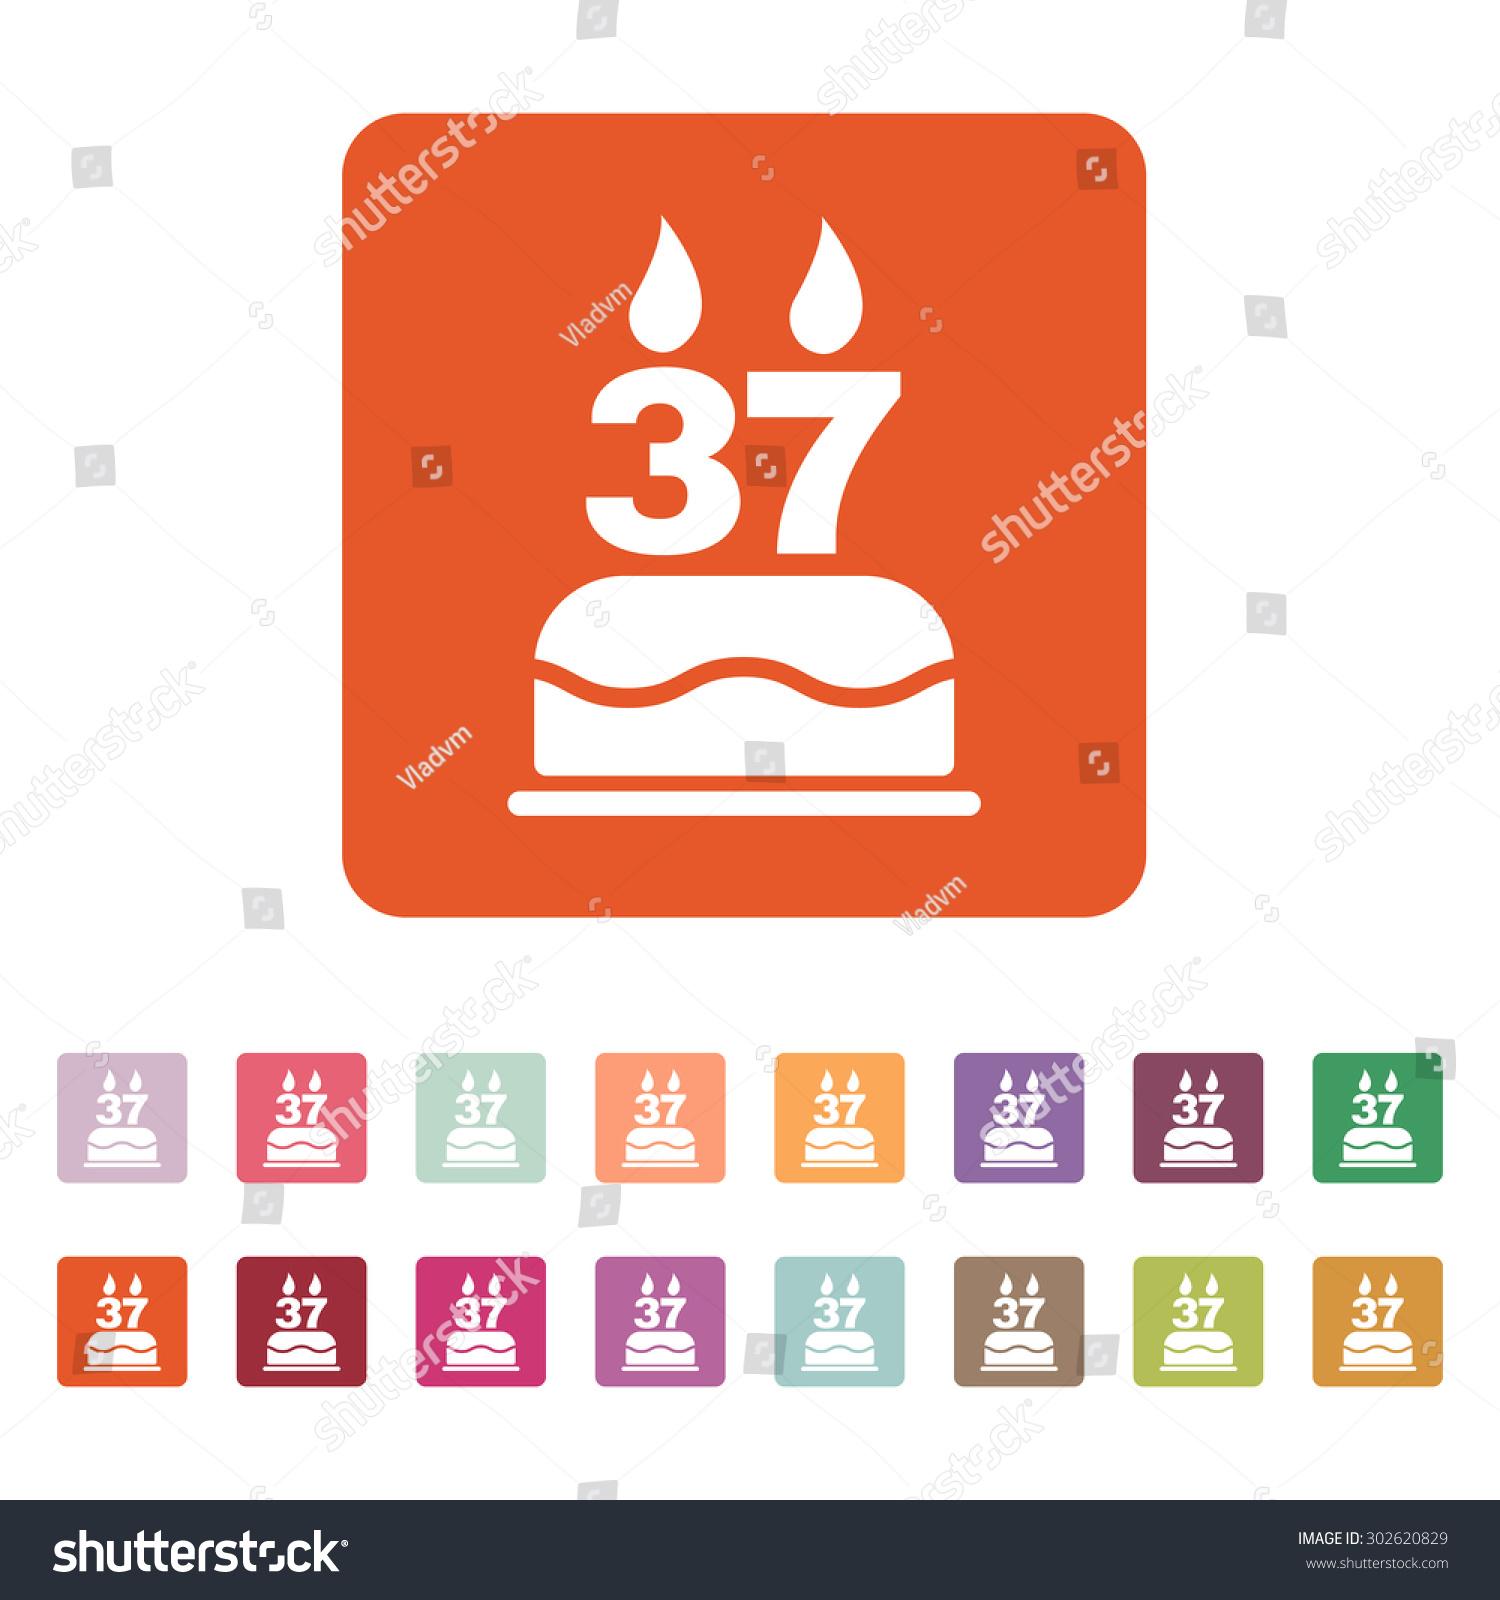 Birthday cake candles form number 37 stock vector 302620829 the birthday cake with candles in the form of number 37 icon birthday symbol biocorpaavc